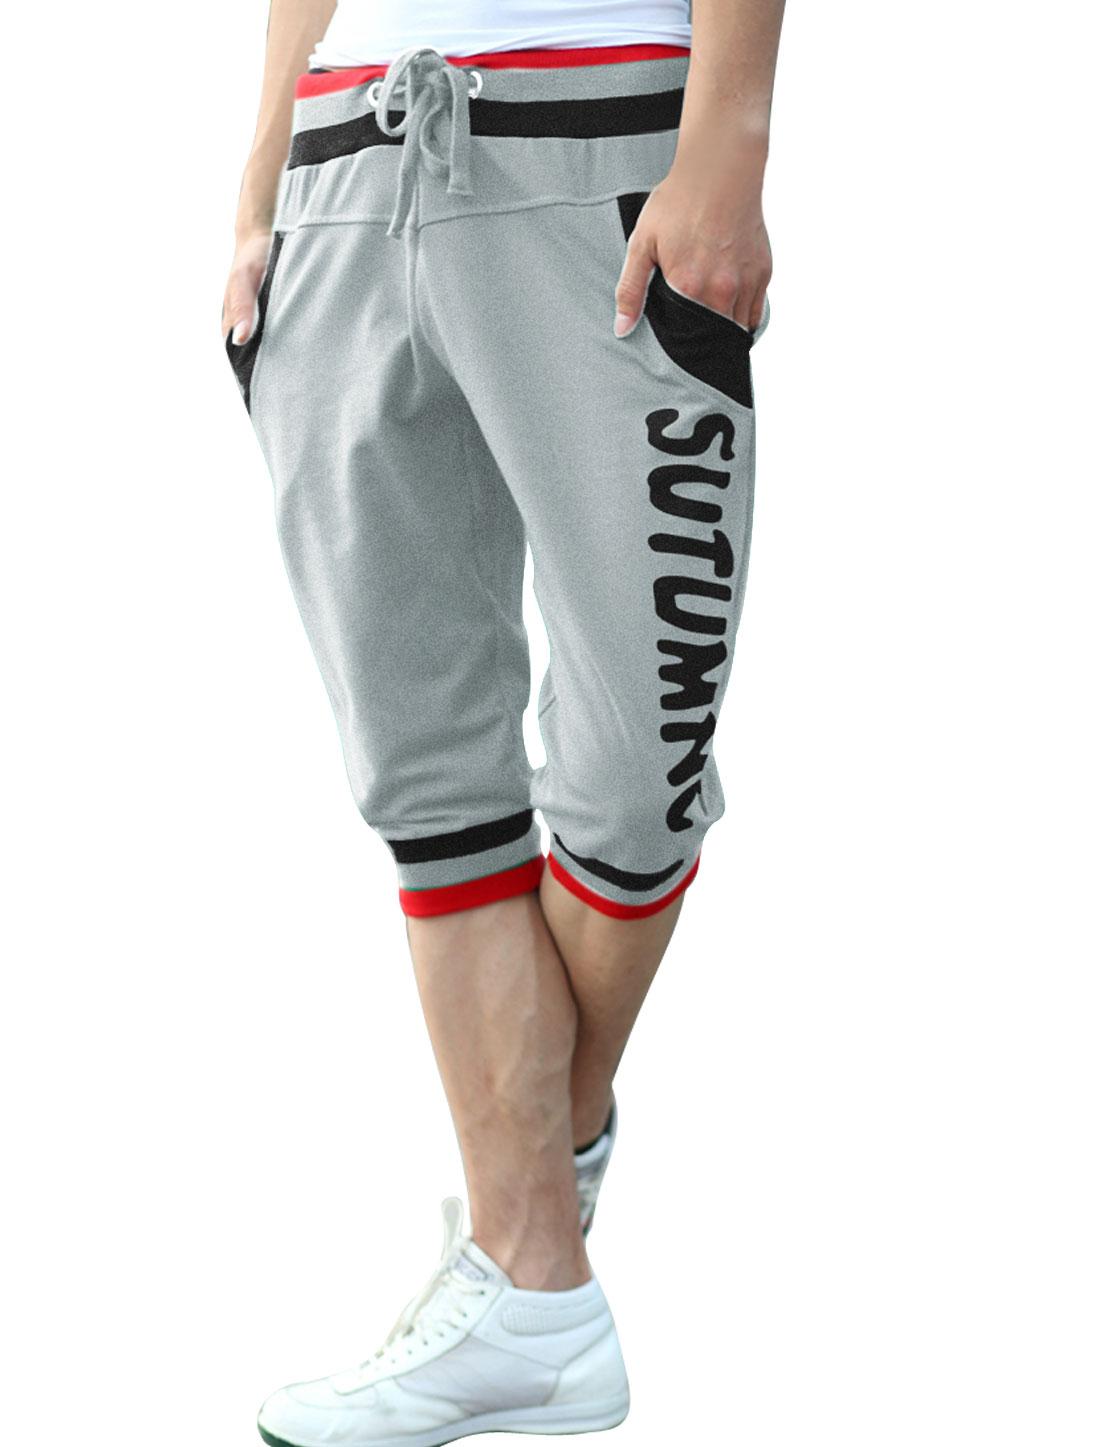 Men Slant Pockets Drawstring Letters Pattern Shorts Light Grey W33